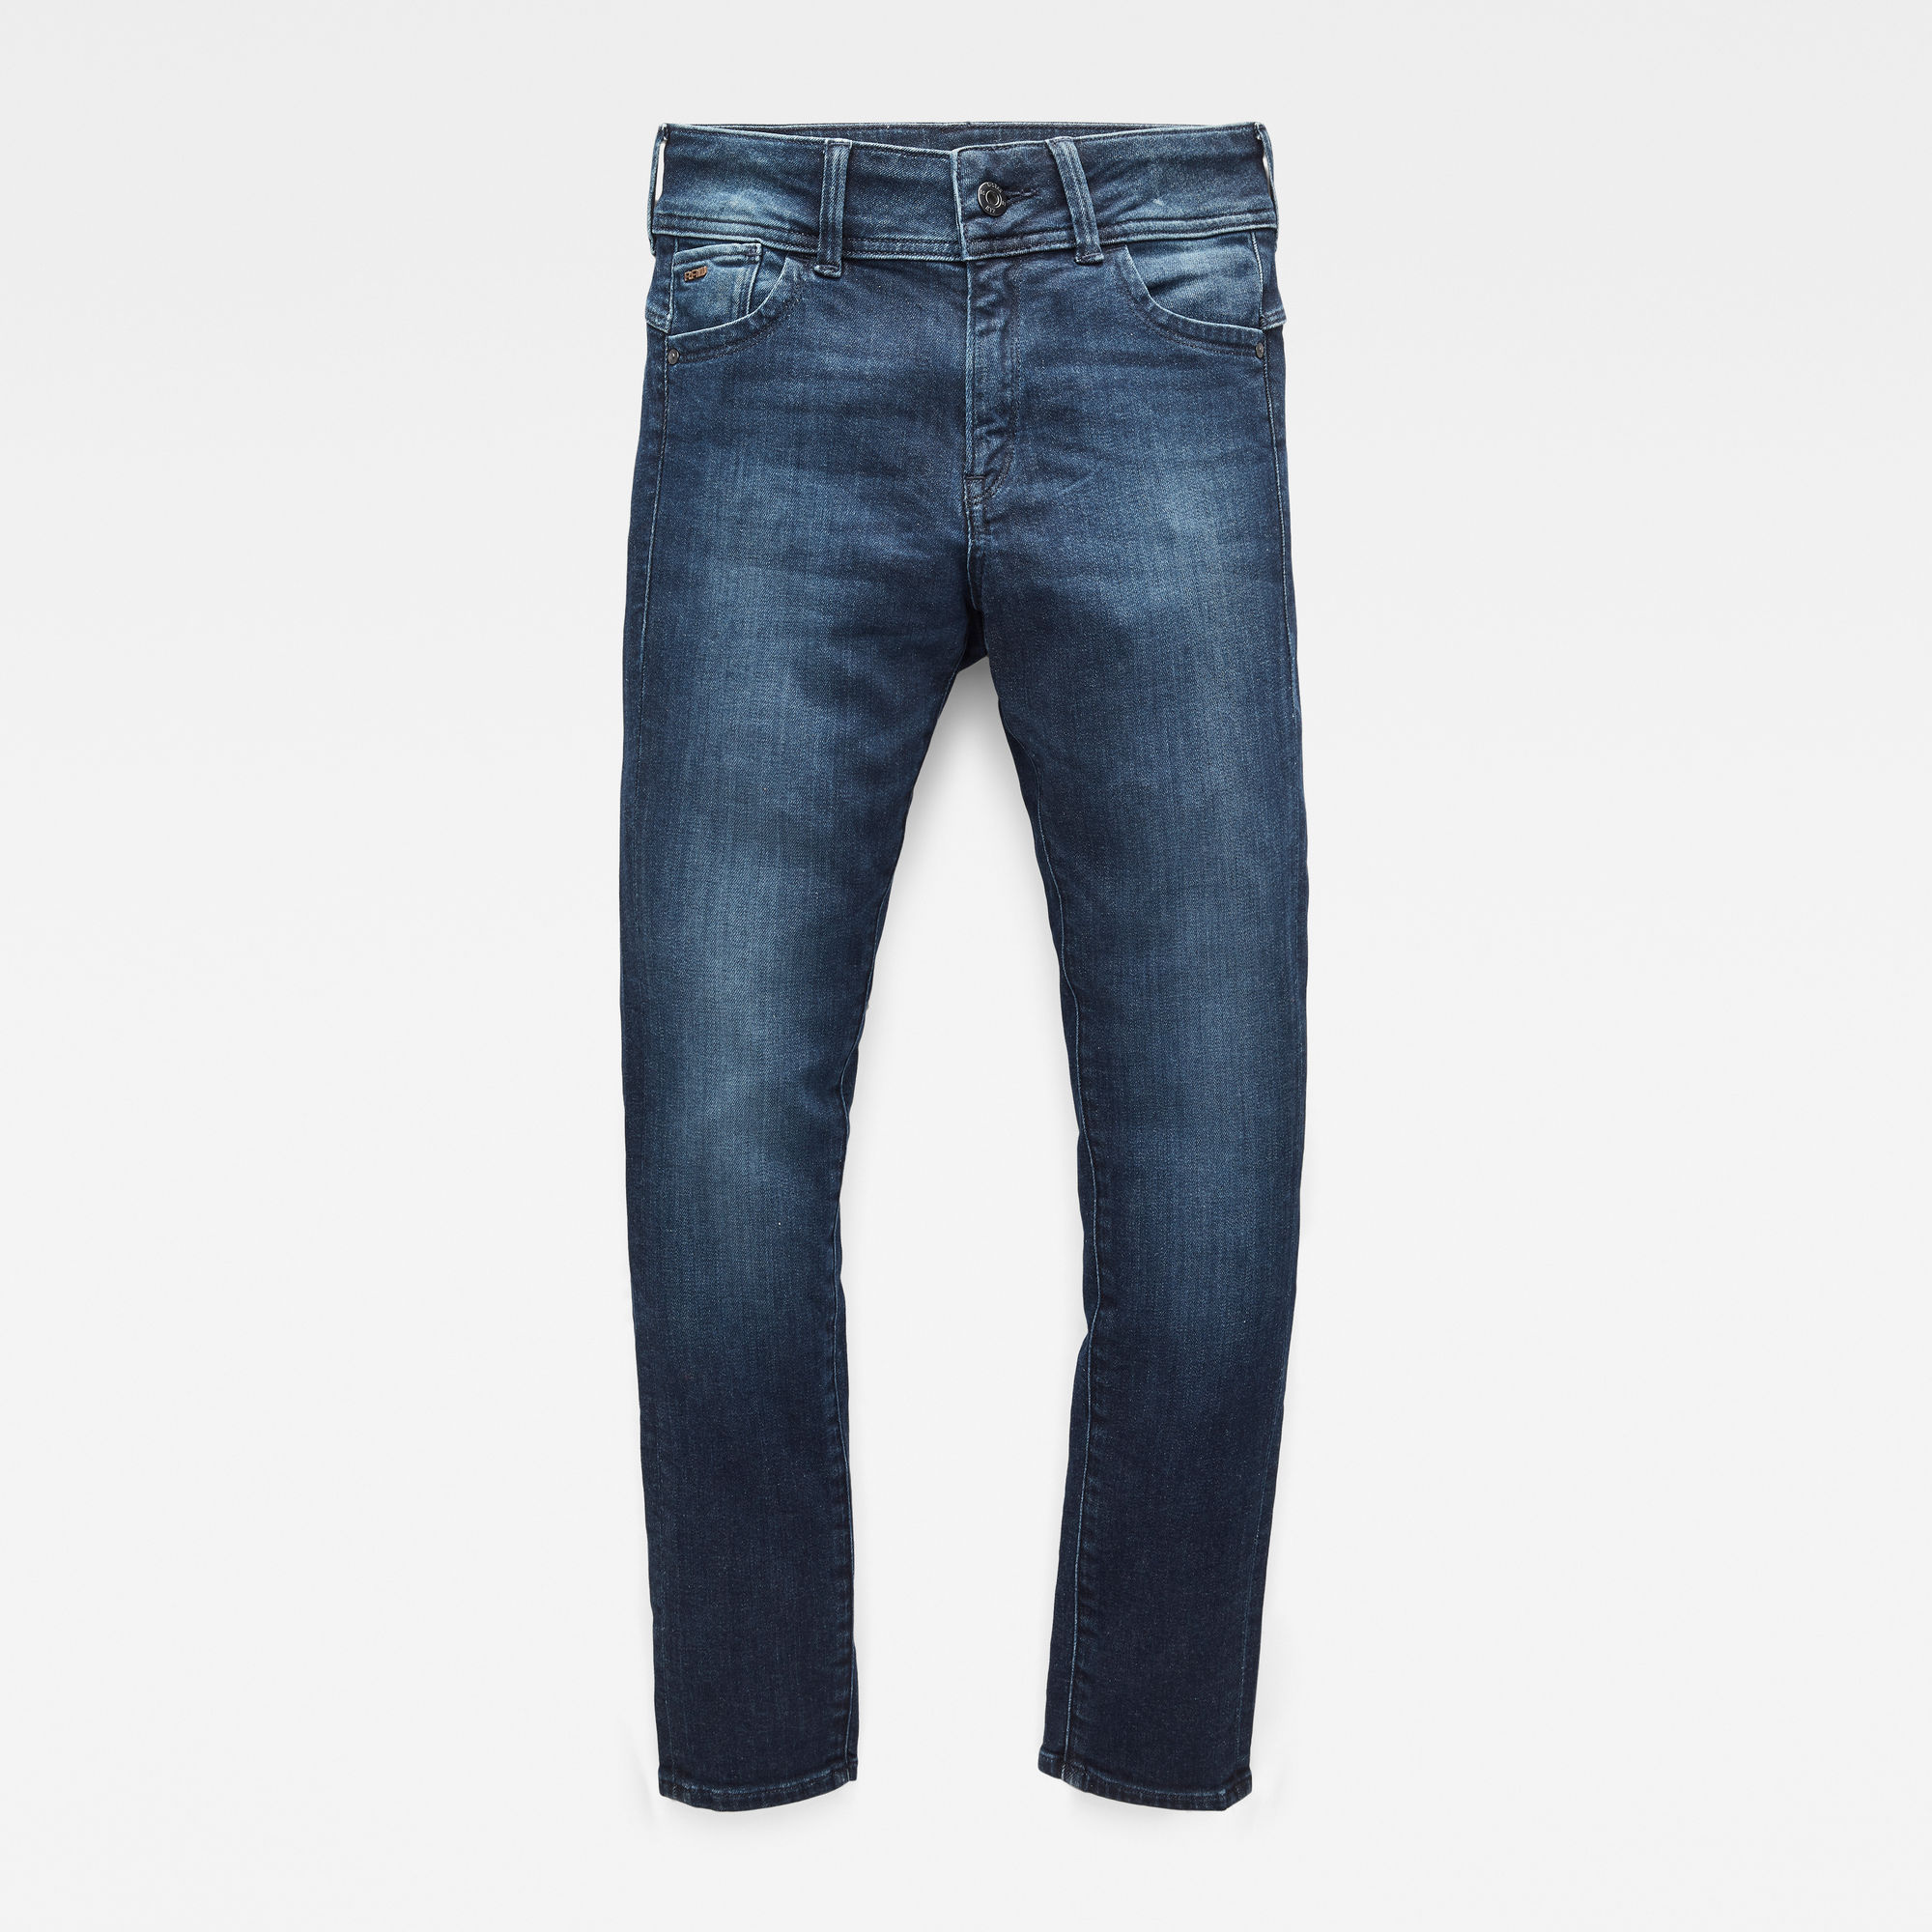 G-Star RAW Meisjes Lynn Skinny Jeans Donkerblauw